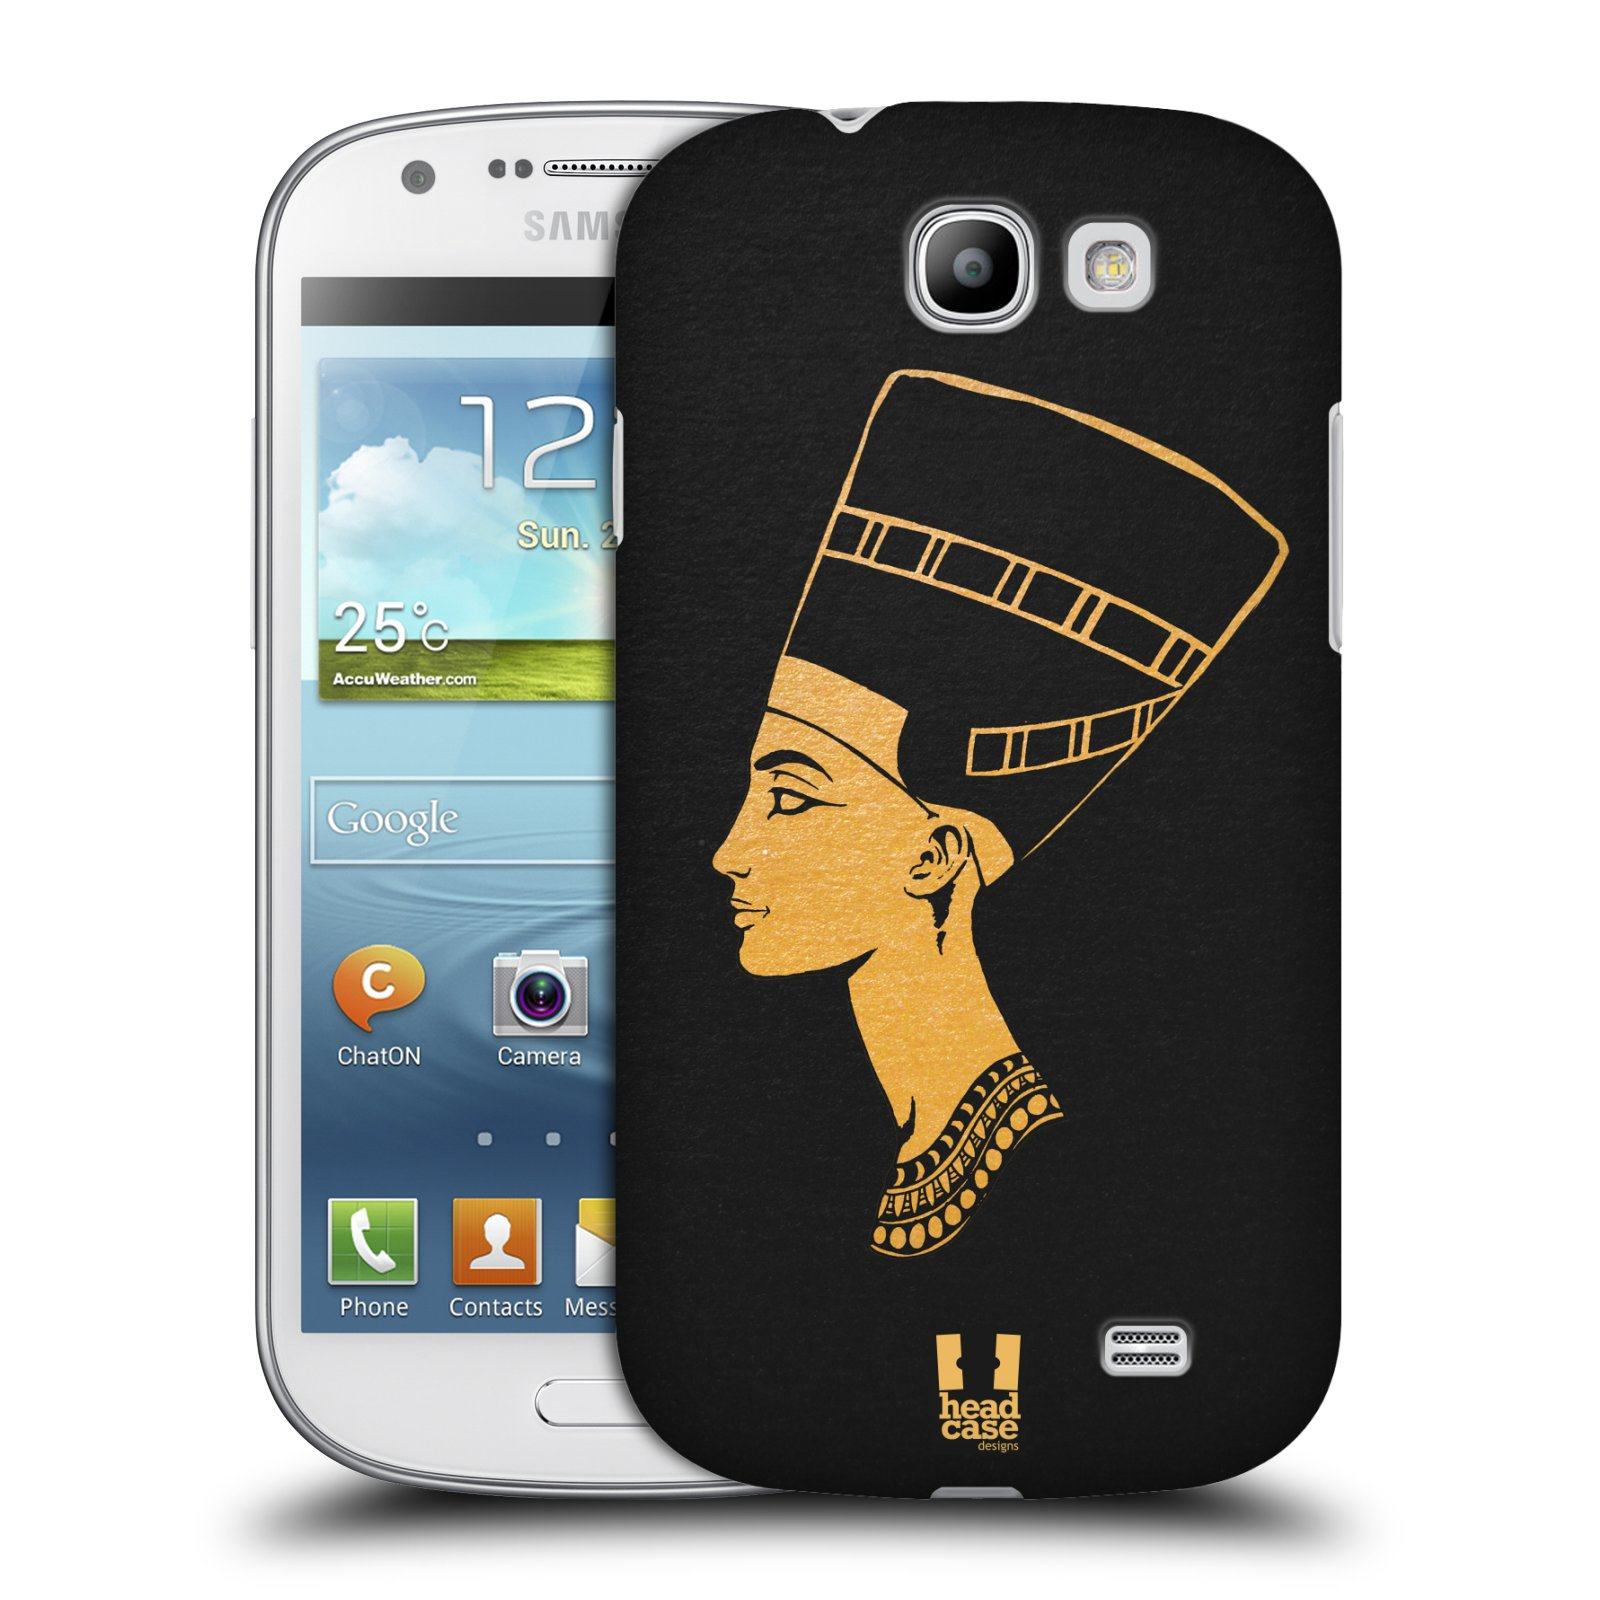 Plastové pouzdro na mobil Samsung Galaxy Express HEAD CASE EGYPT NEFERTITI (Kryt či obal na mobilní telefon Samsung Galaxy Express GT-i8730)